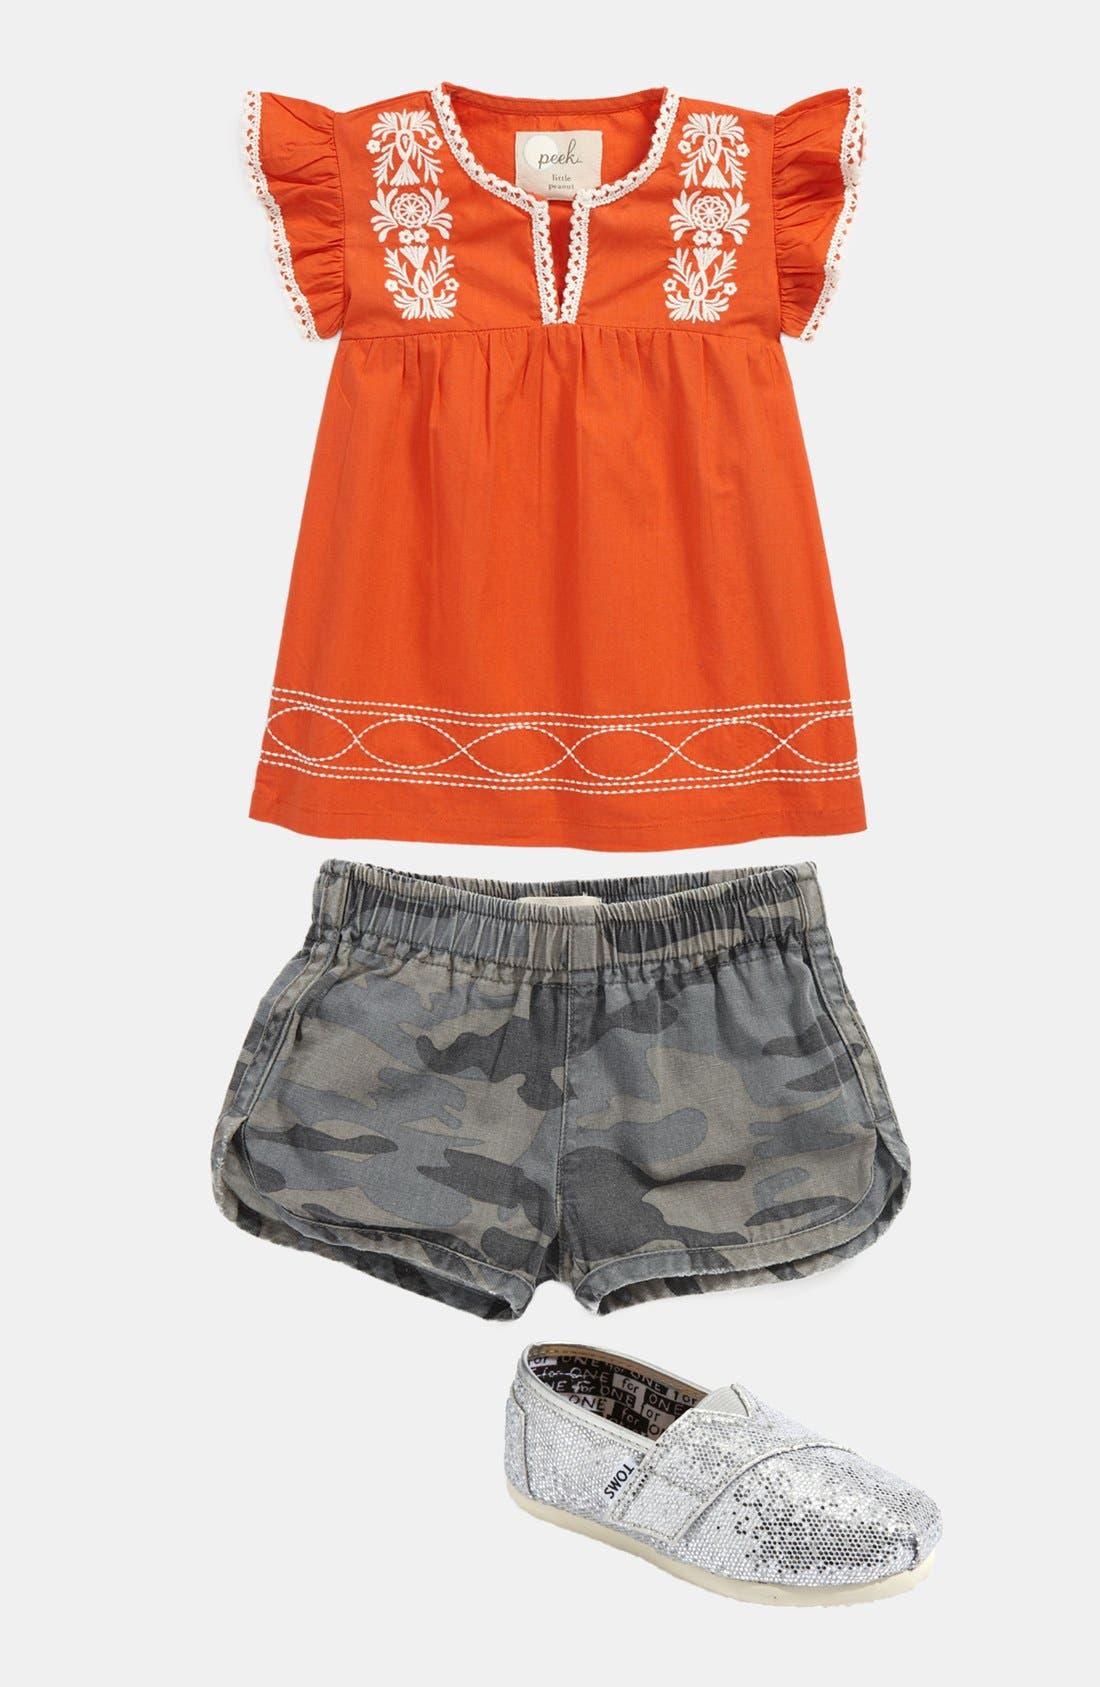 Main Image - Peek Dress & Shorts, TOMS Slip-On